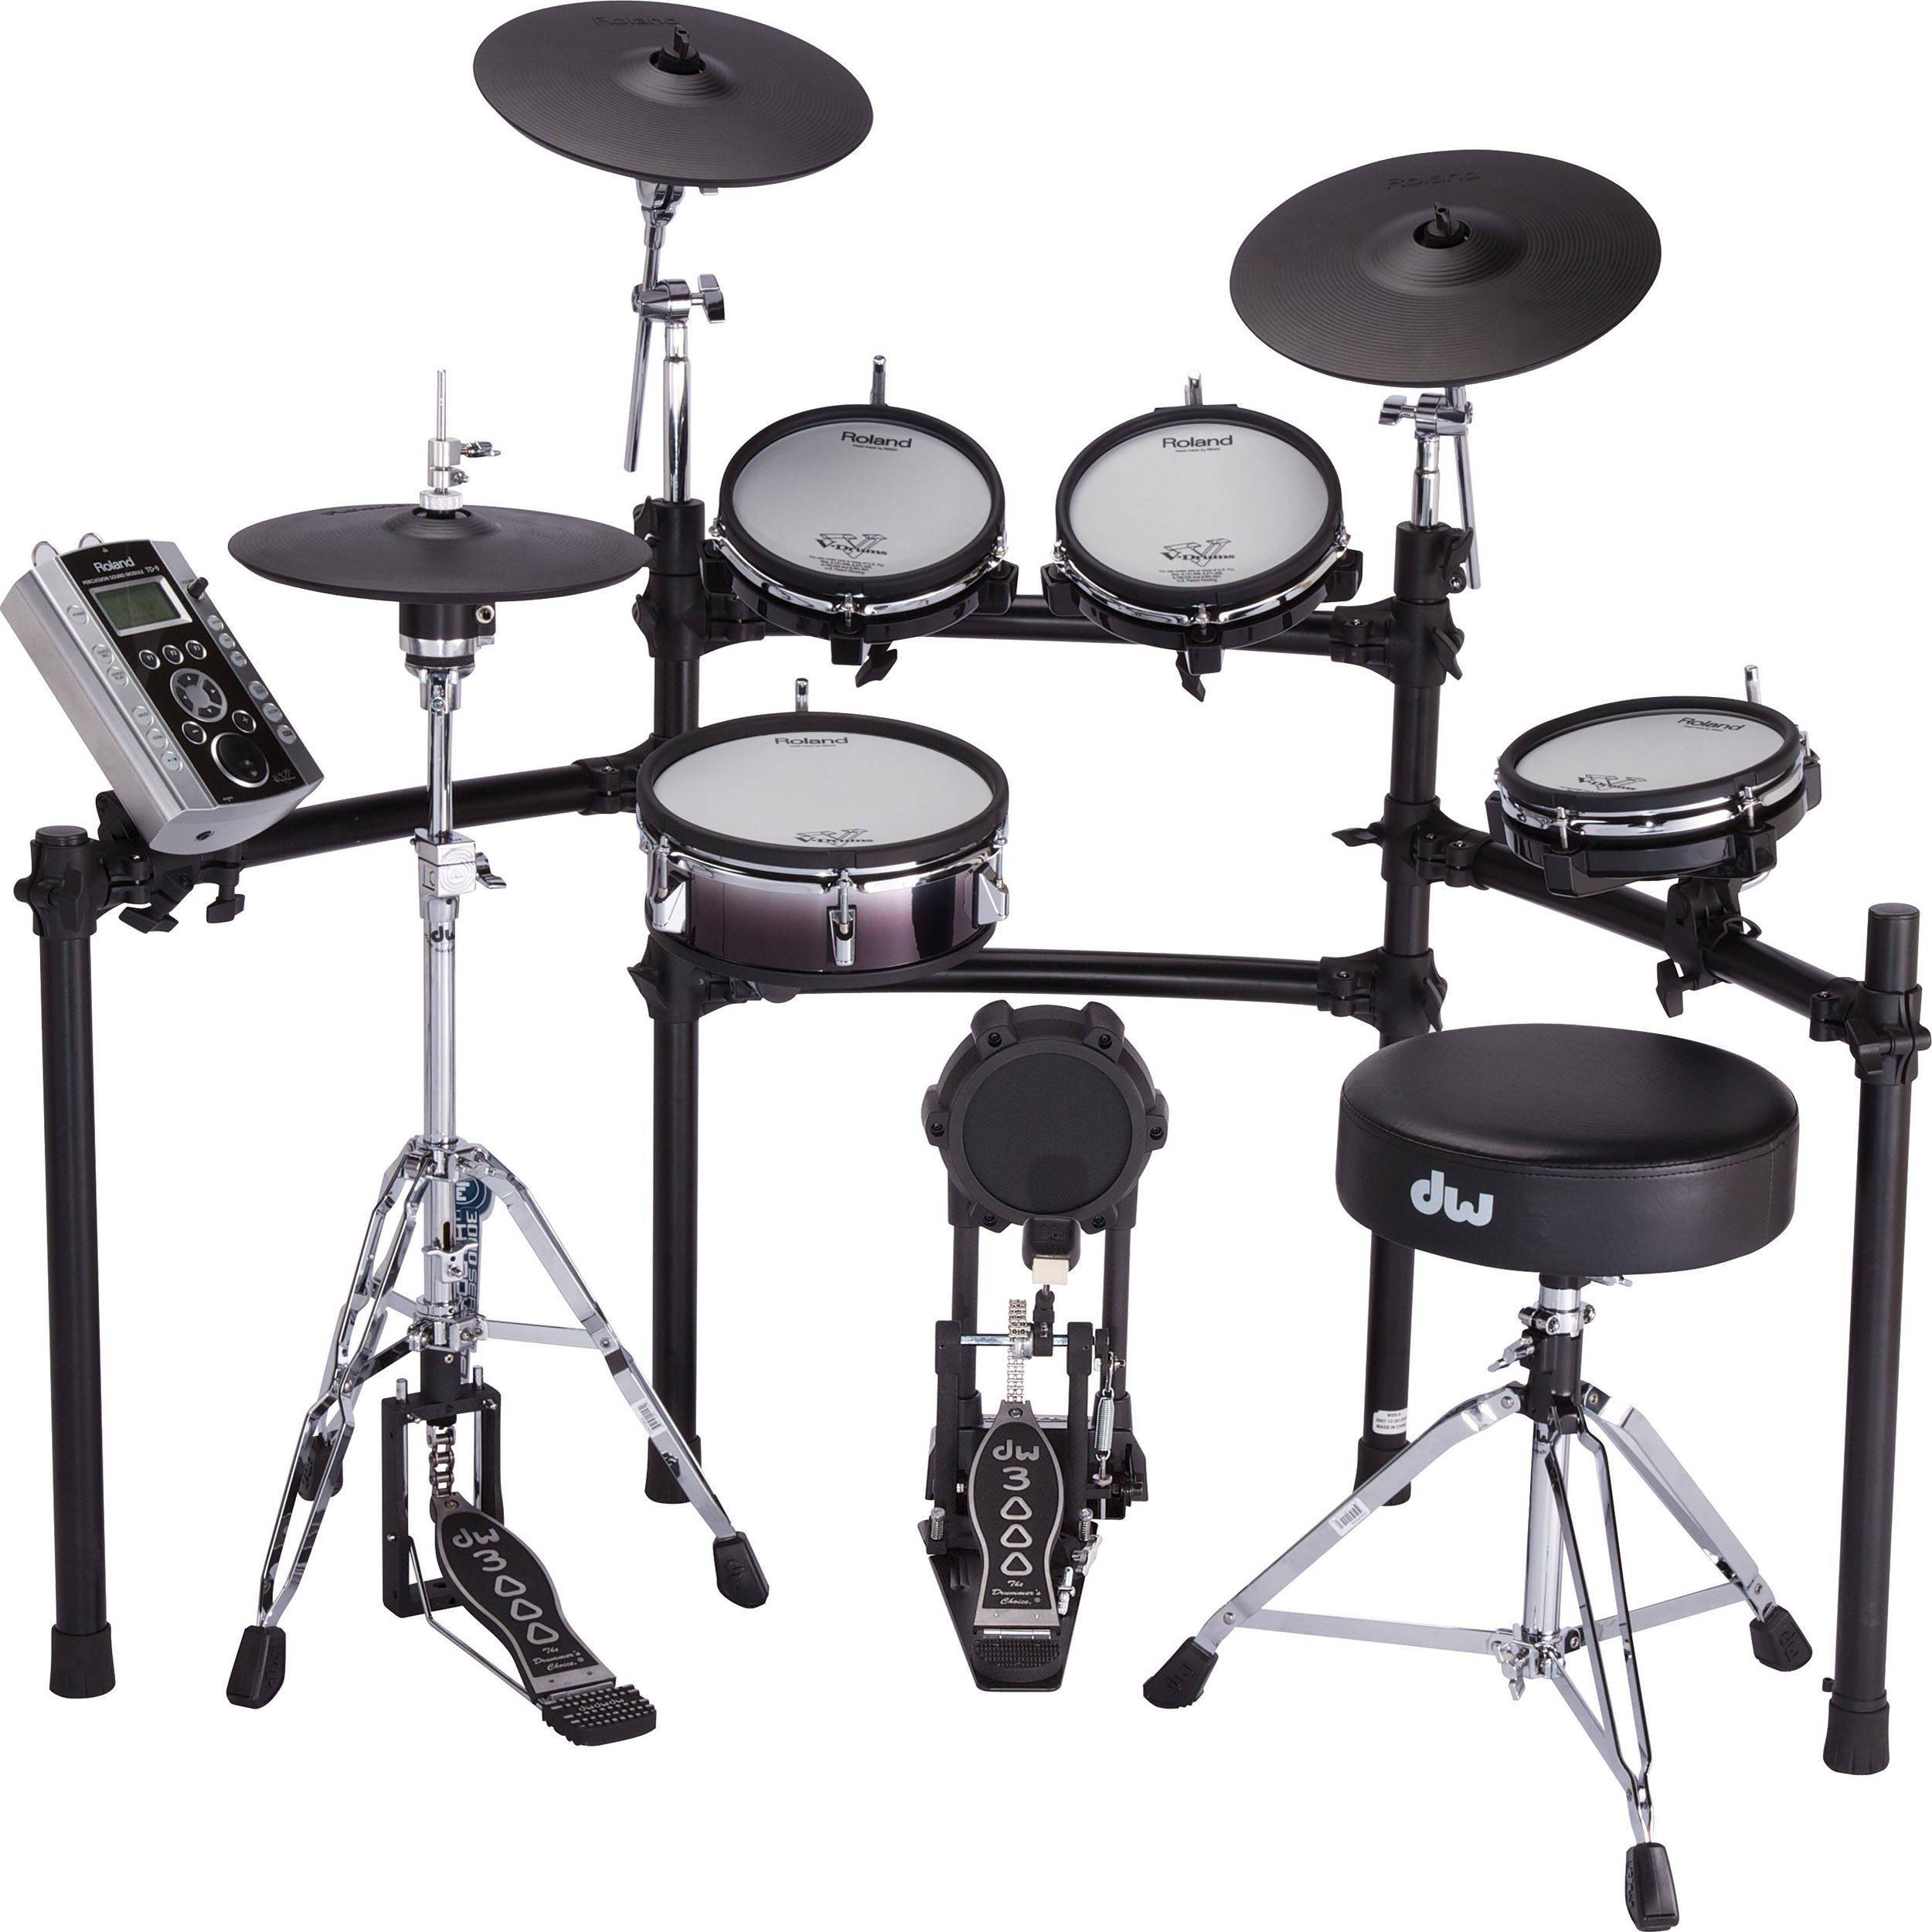 roland td 9kx2 v tour series v drum set td 9kx2 s old b h photo rh bhphotovideo com  roland td 9 user guide